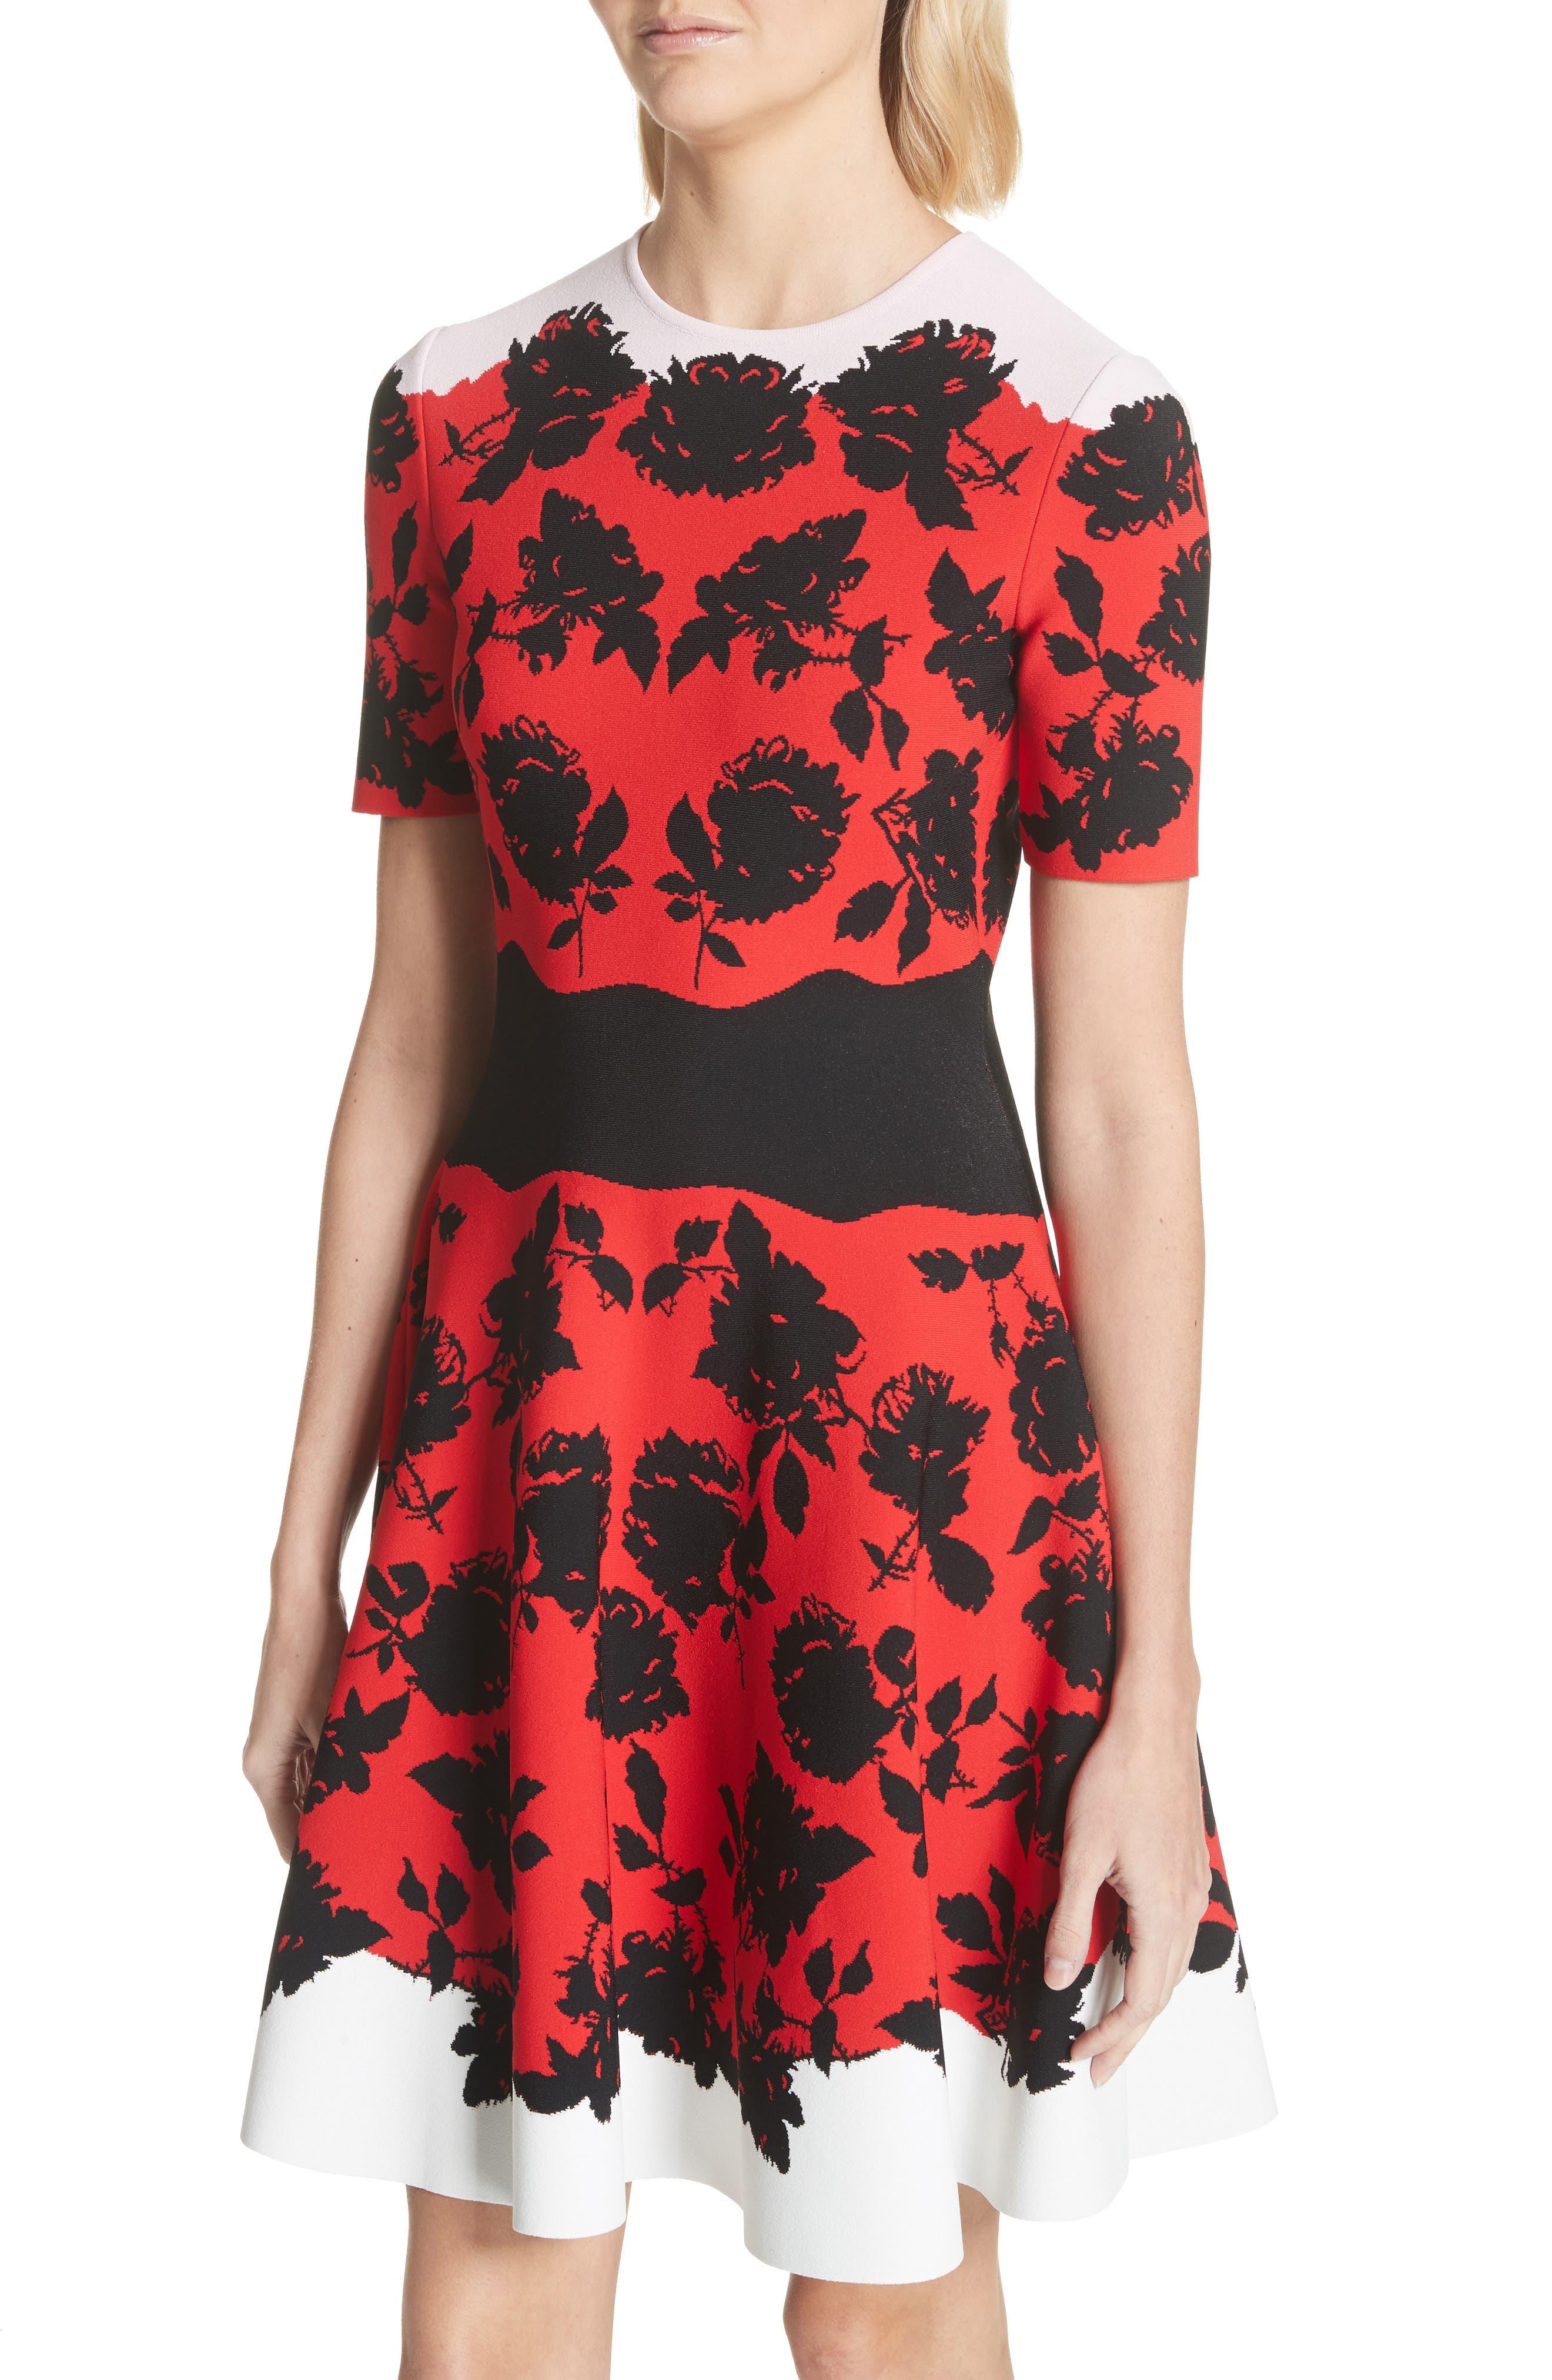 Rose Jacquard Knit Flounce Dress,                             Alternate thumbnail 4, color,                             Red/ Black/ Ivory/ Pink